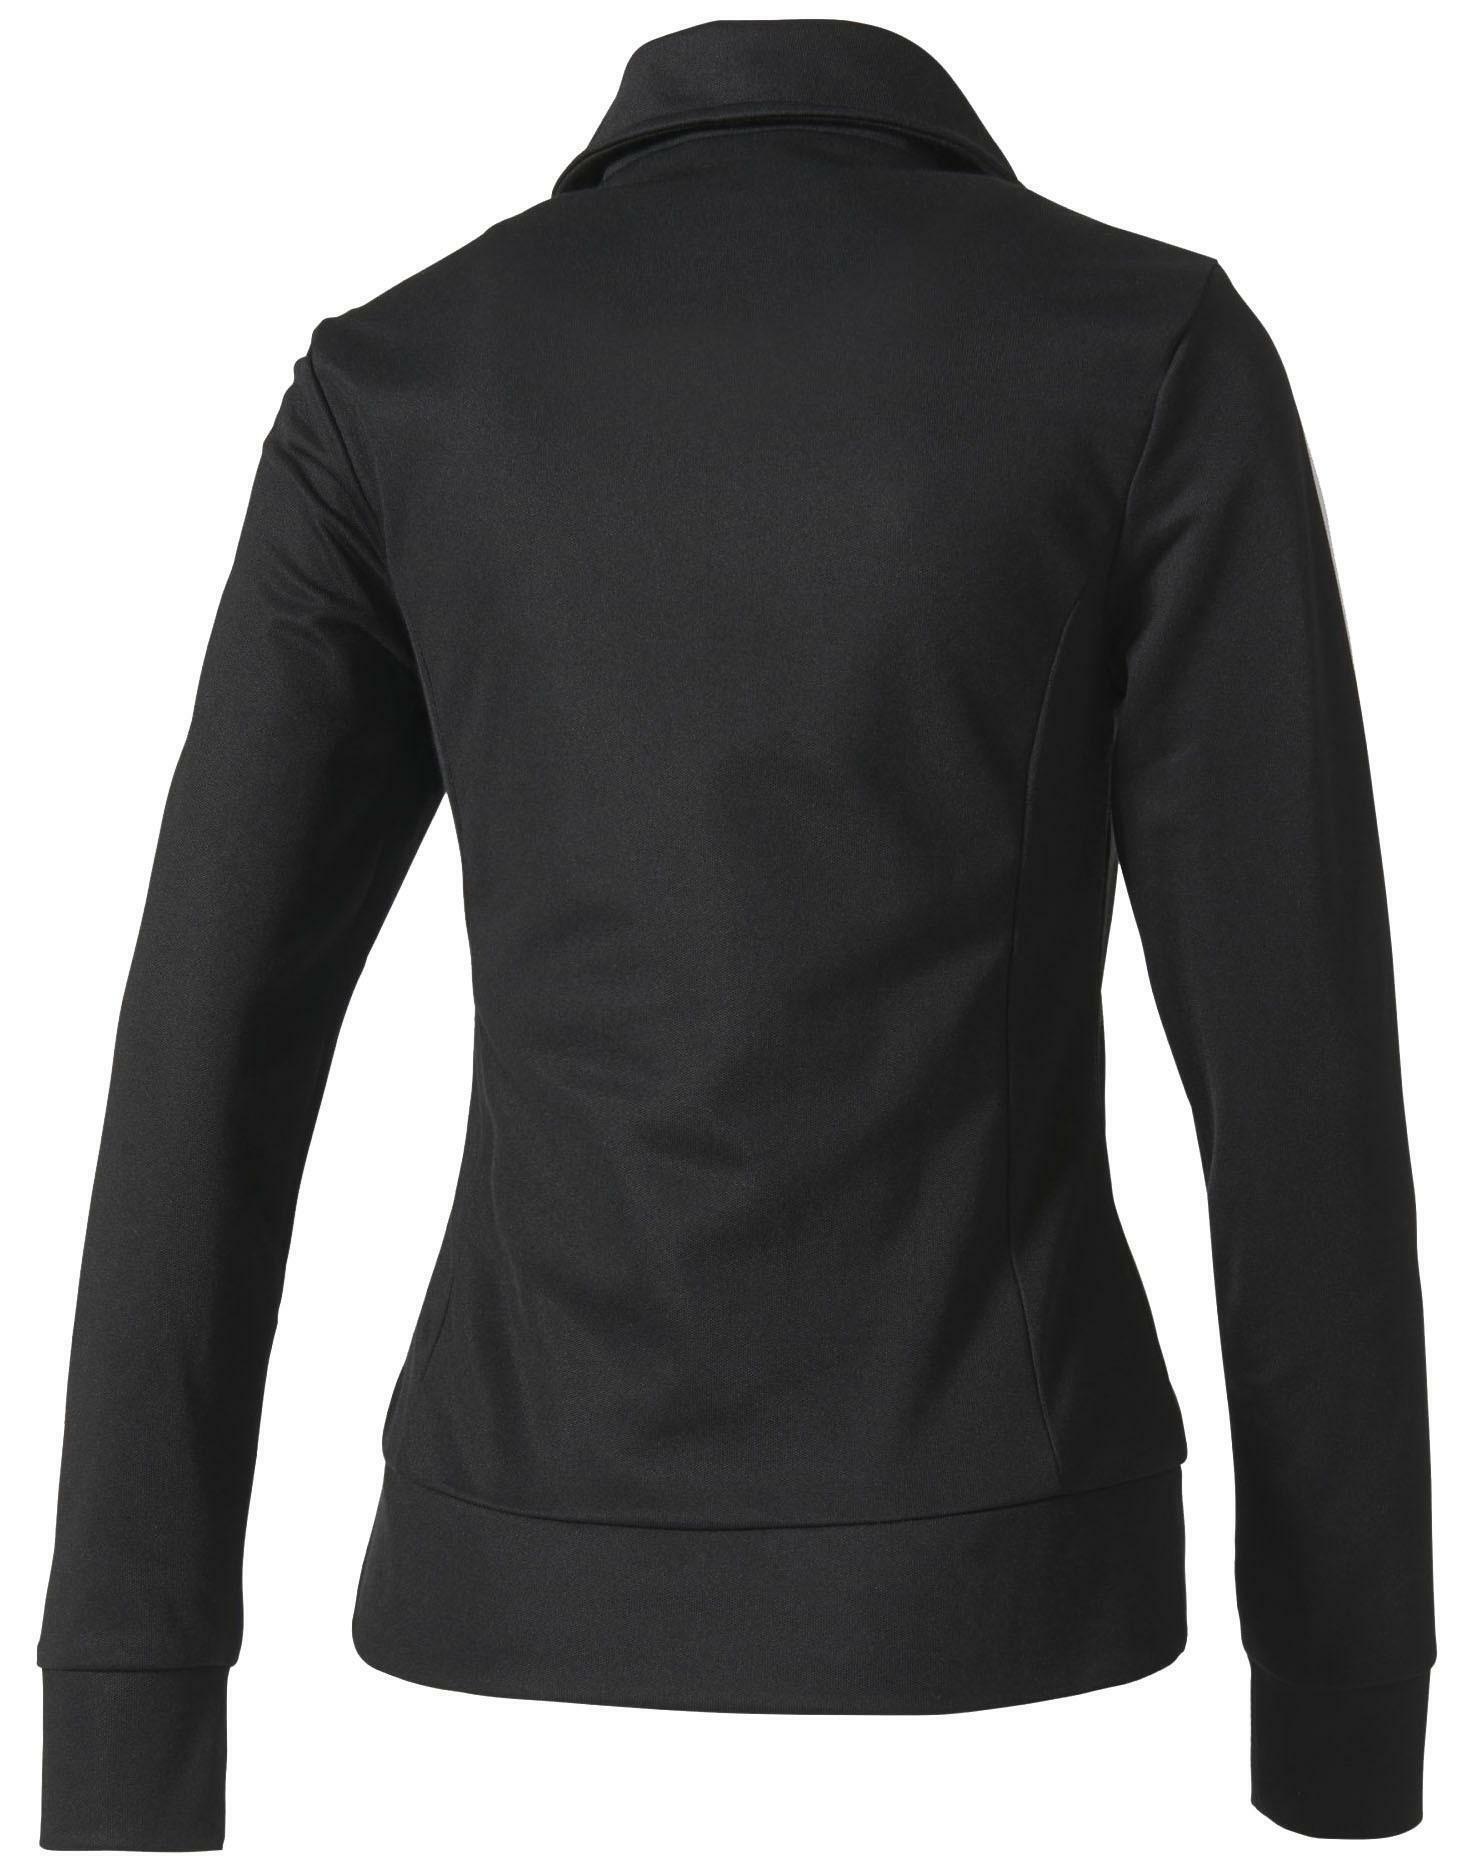 adidas originals europa tt giacchetto donna nero